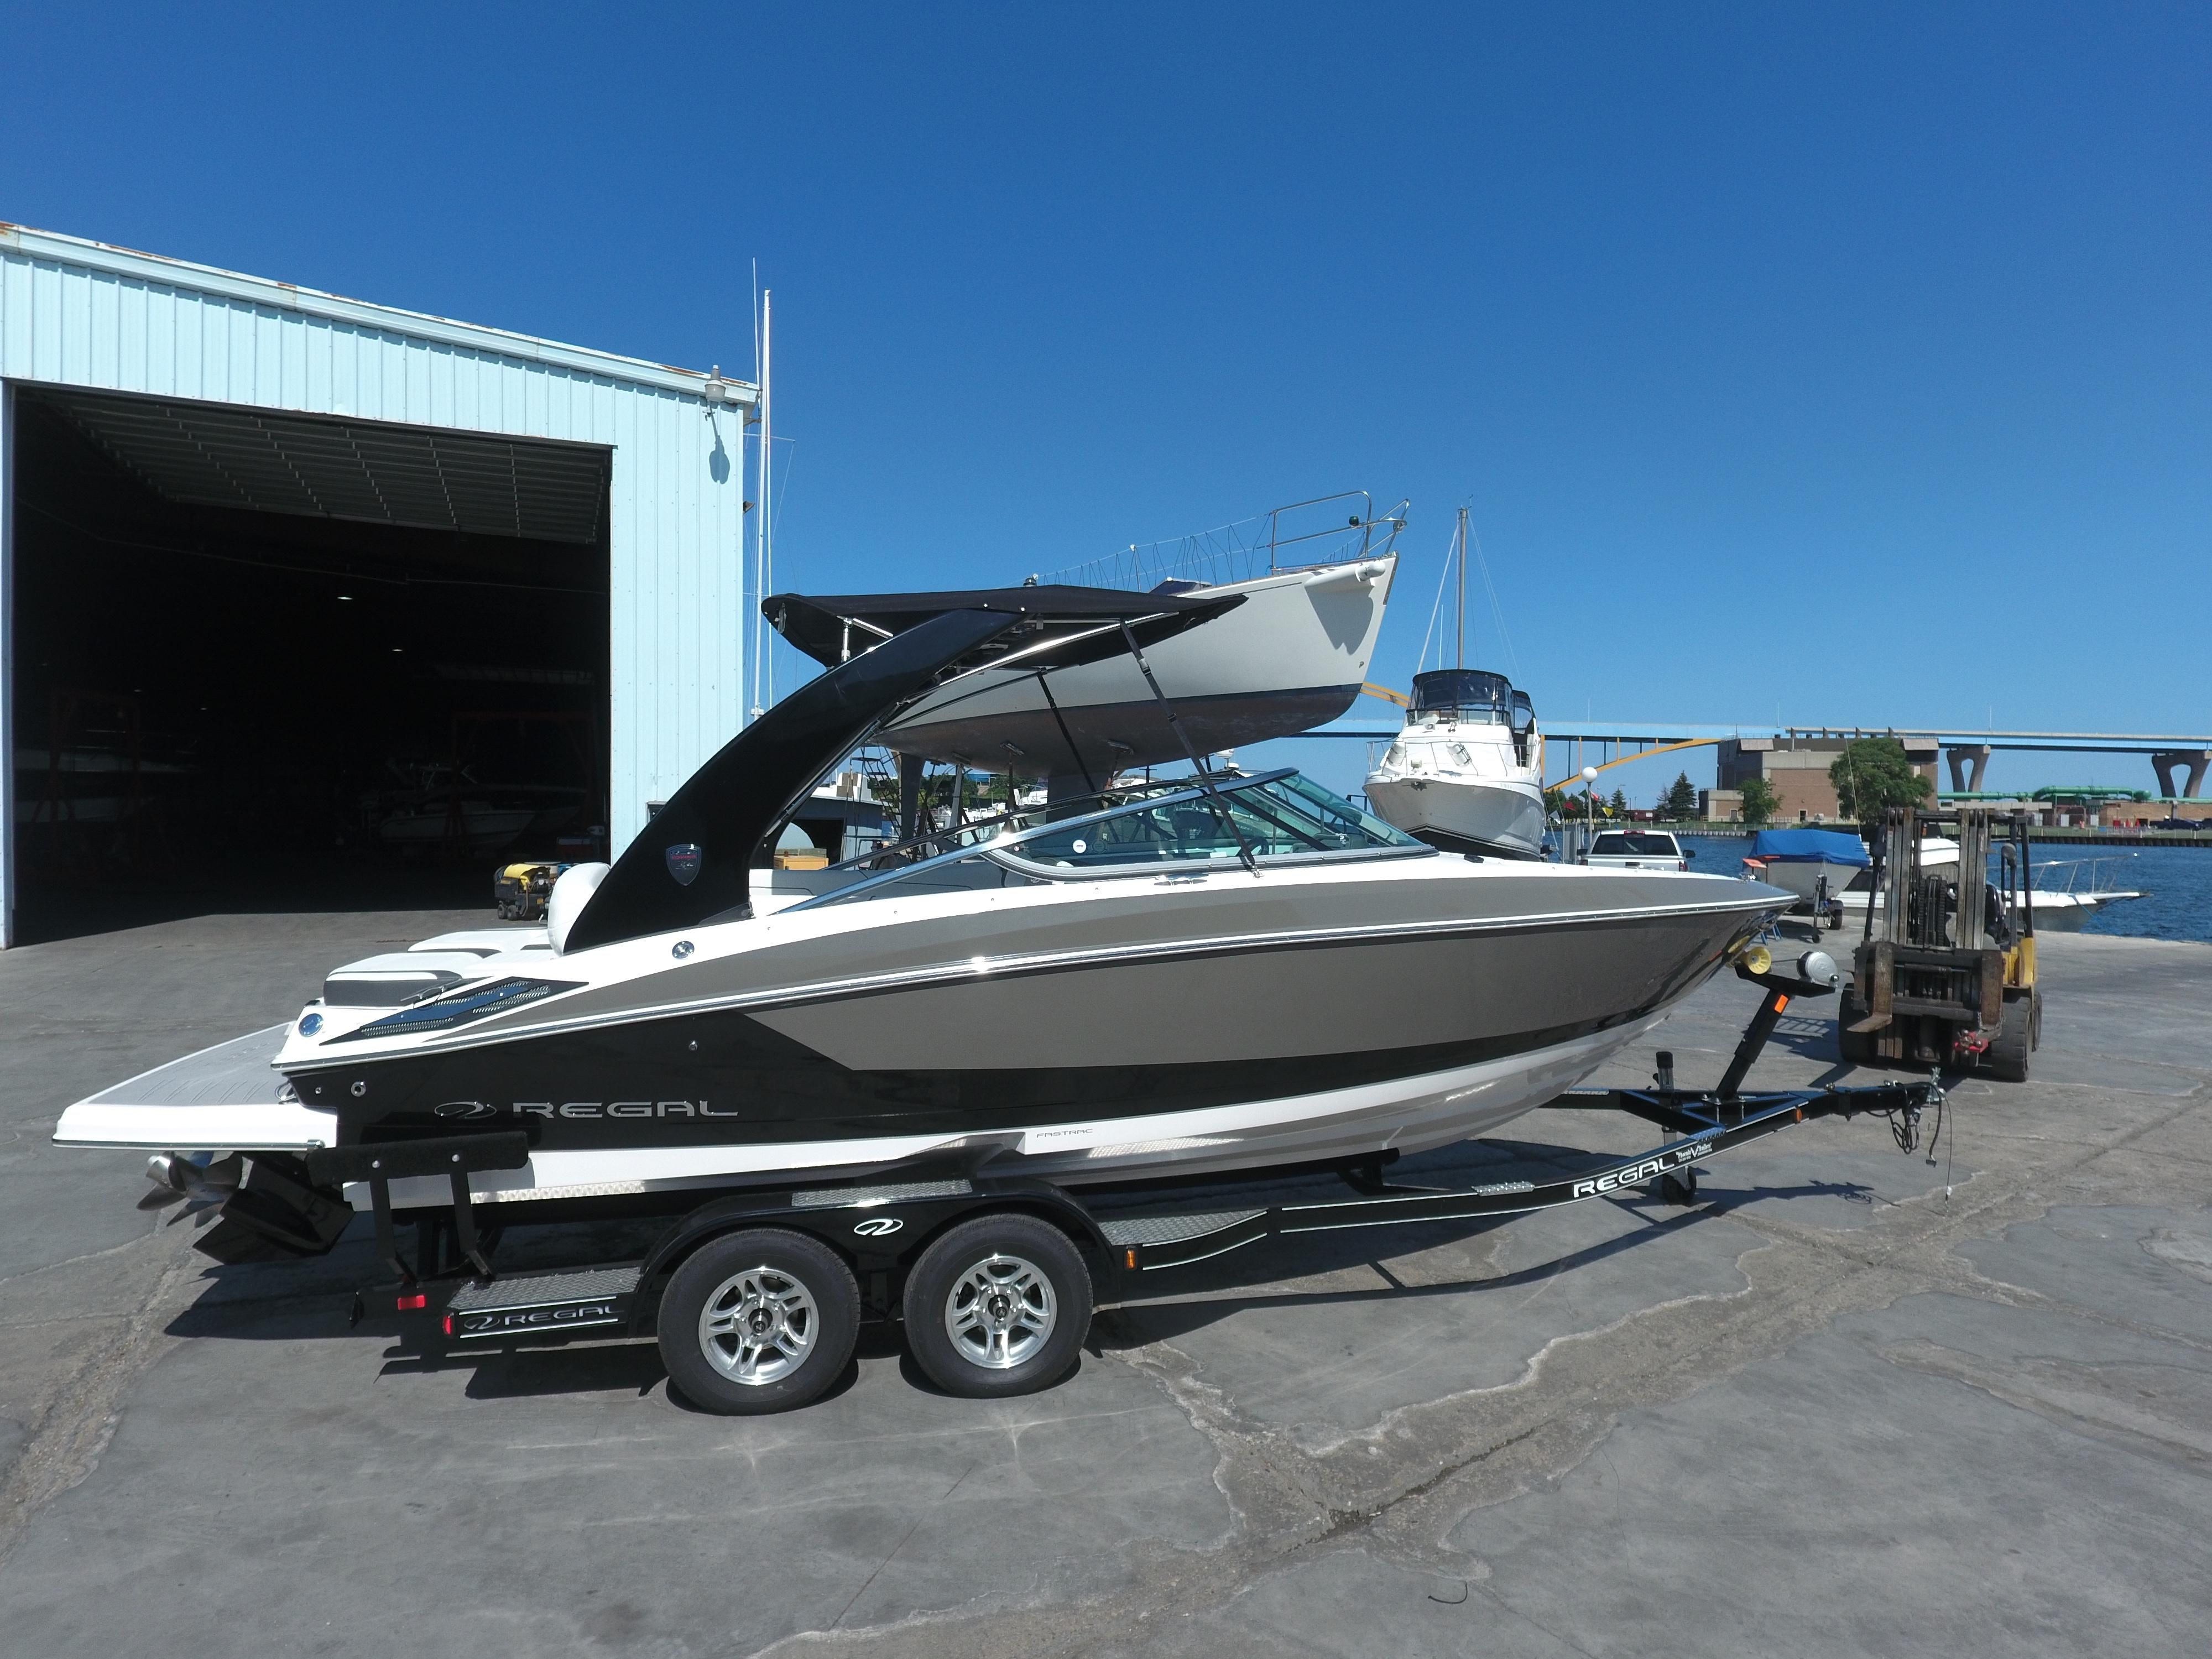 2017 regal 2300 bowrider power boat for sale www for Regal flooring arizona